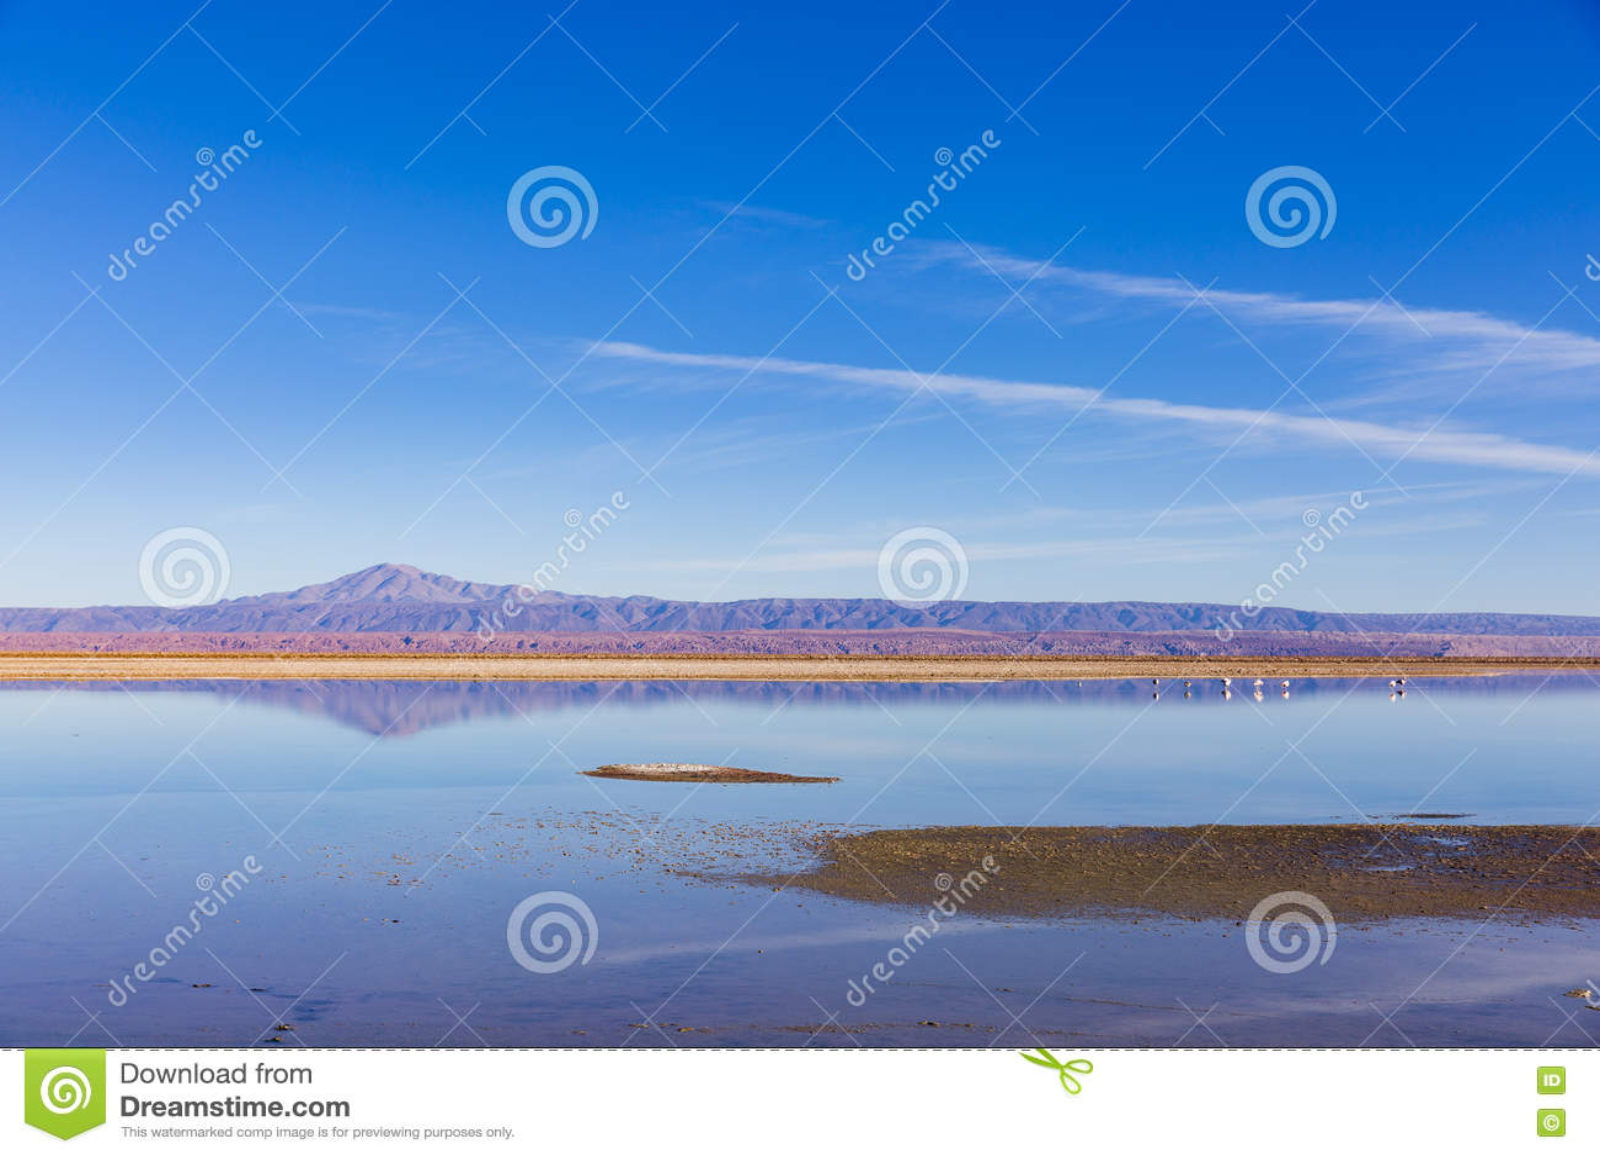 Flamingos, See, Farben und entfernte Berge im Los-Flamenco-national Reserve